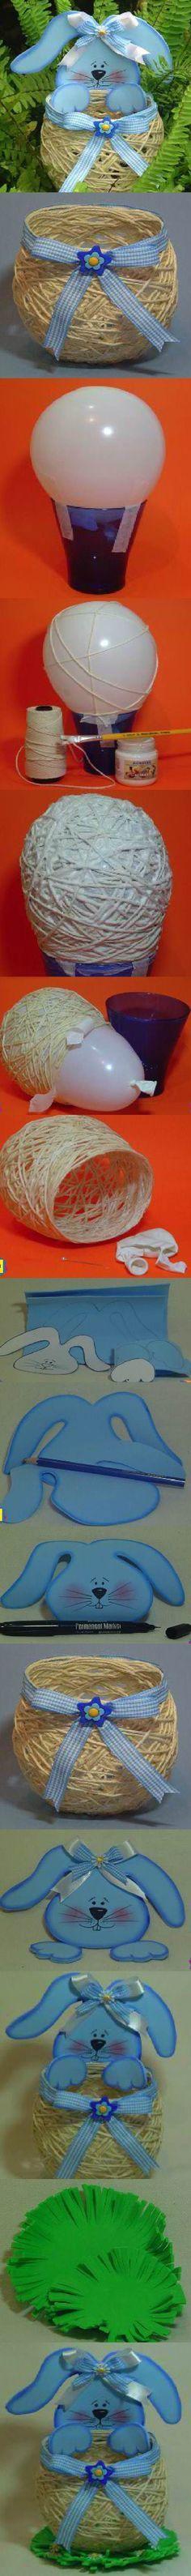 DIY Yarn String Easter Basket .: